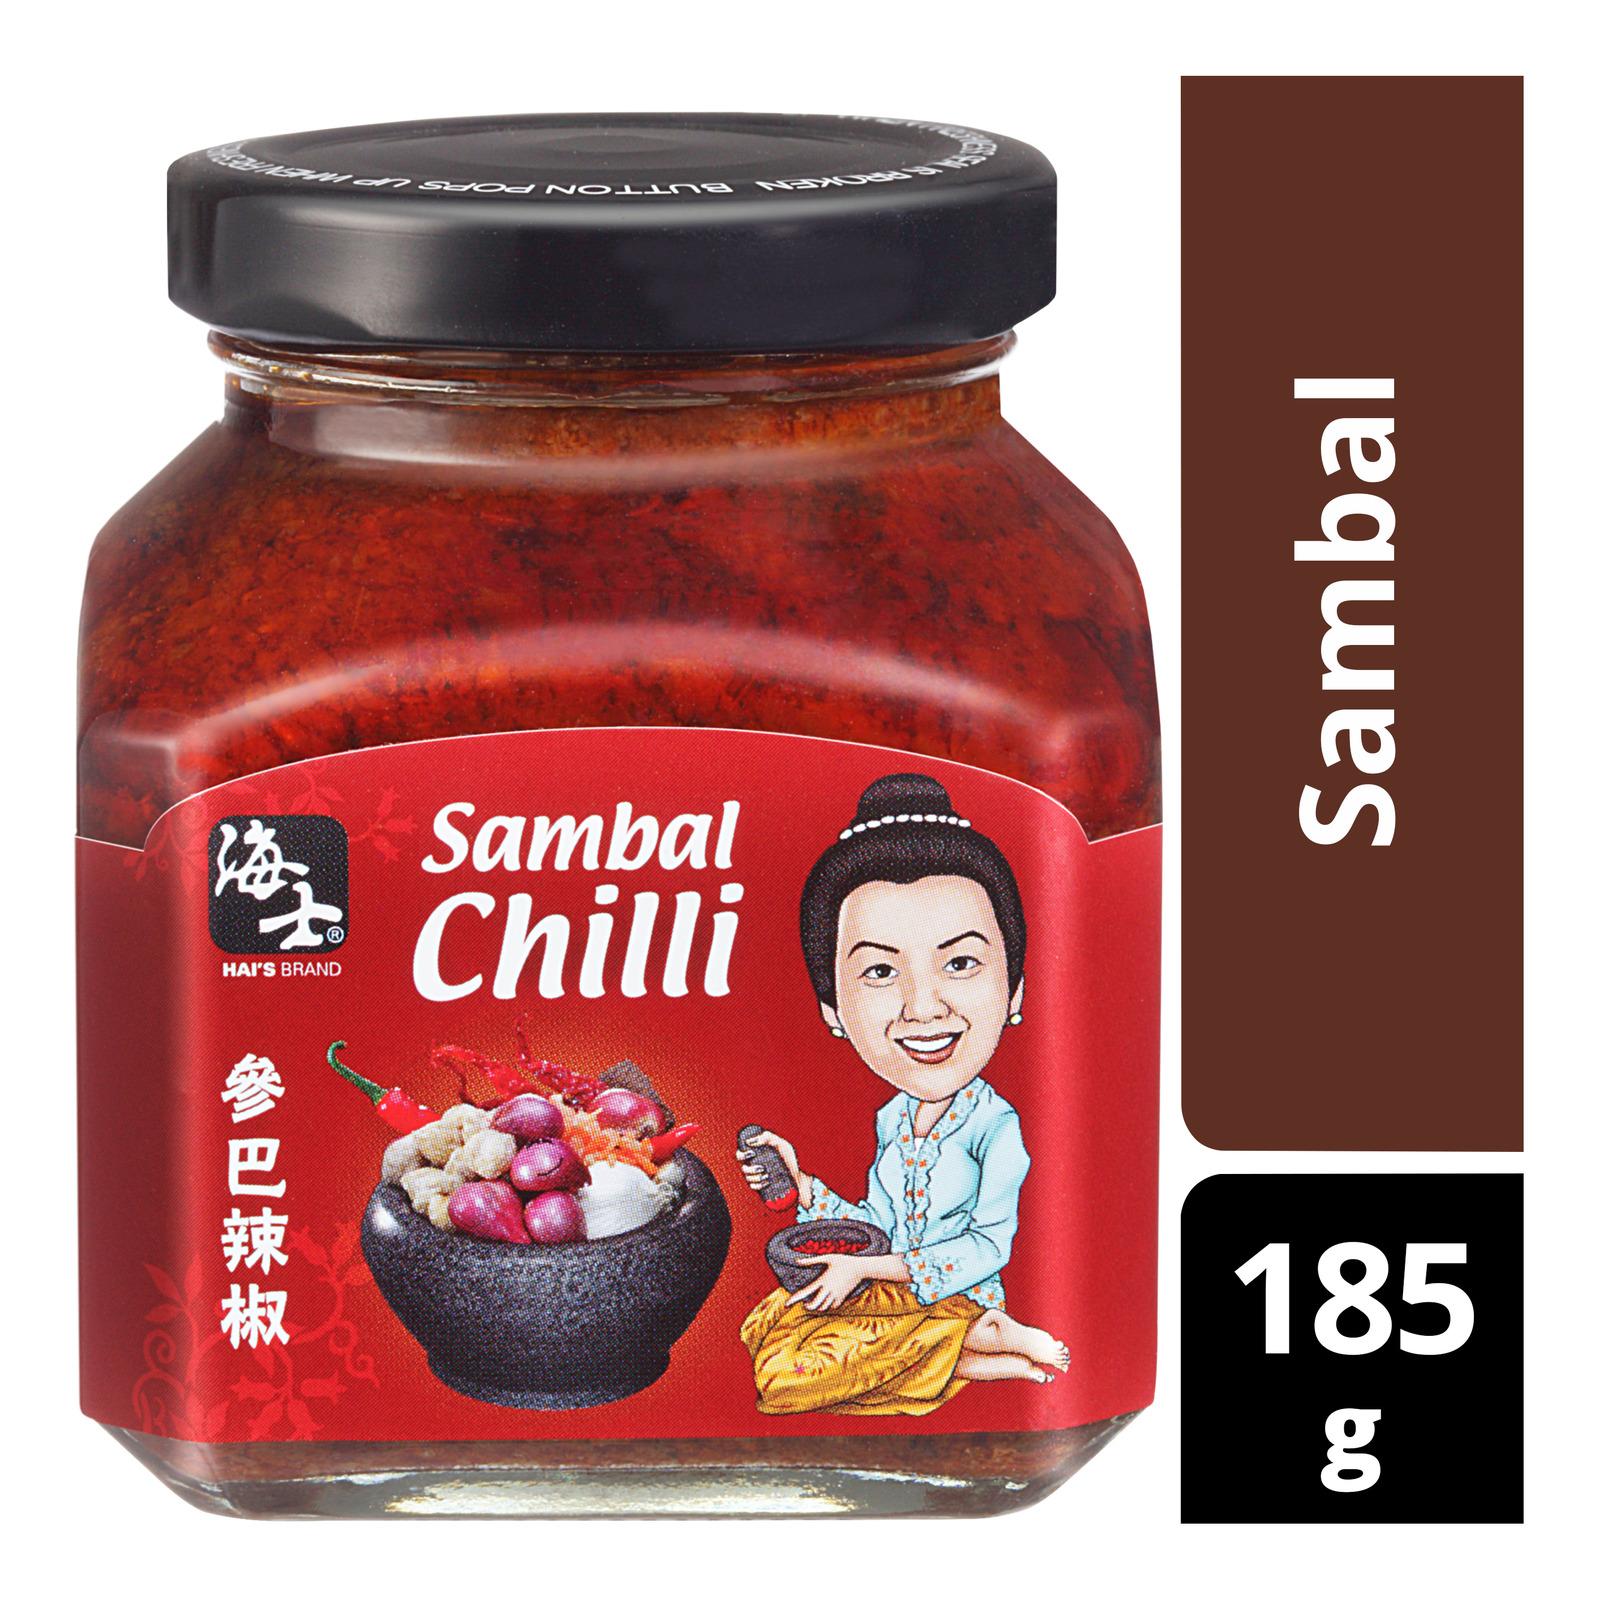 Hai's Chili Sauce - Sambal